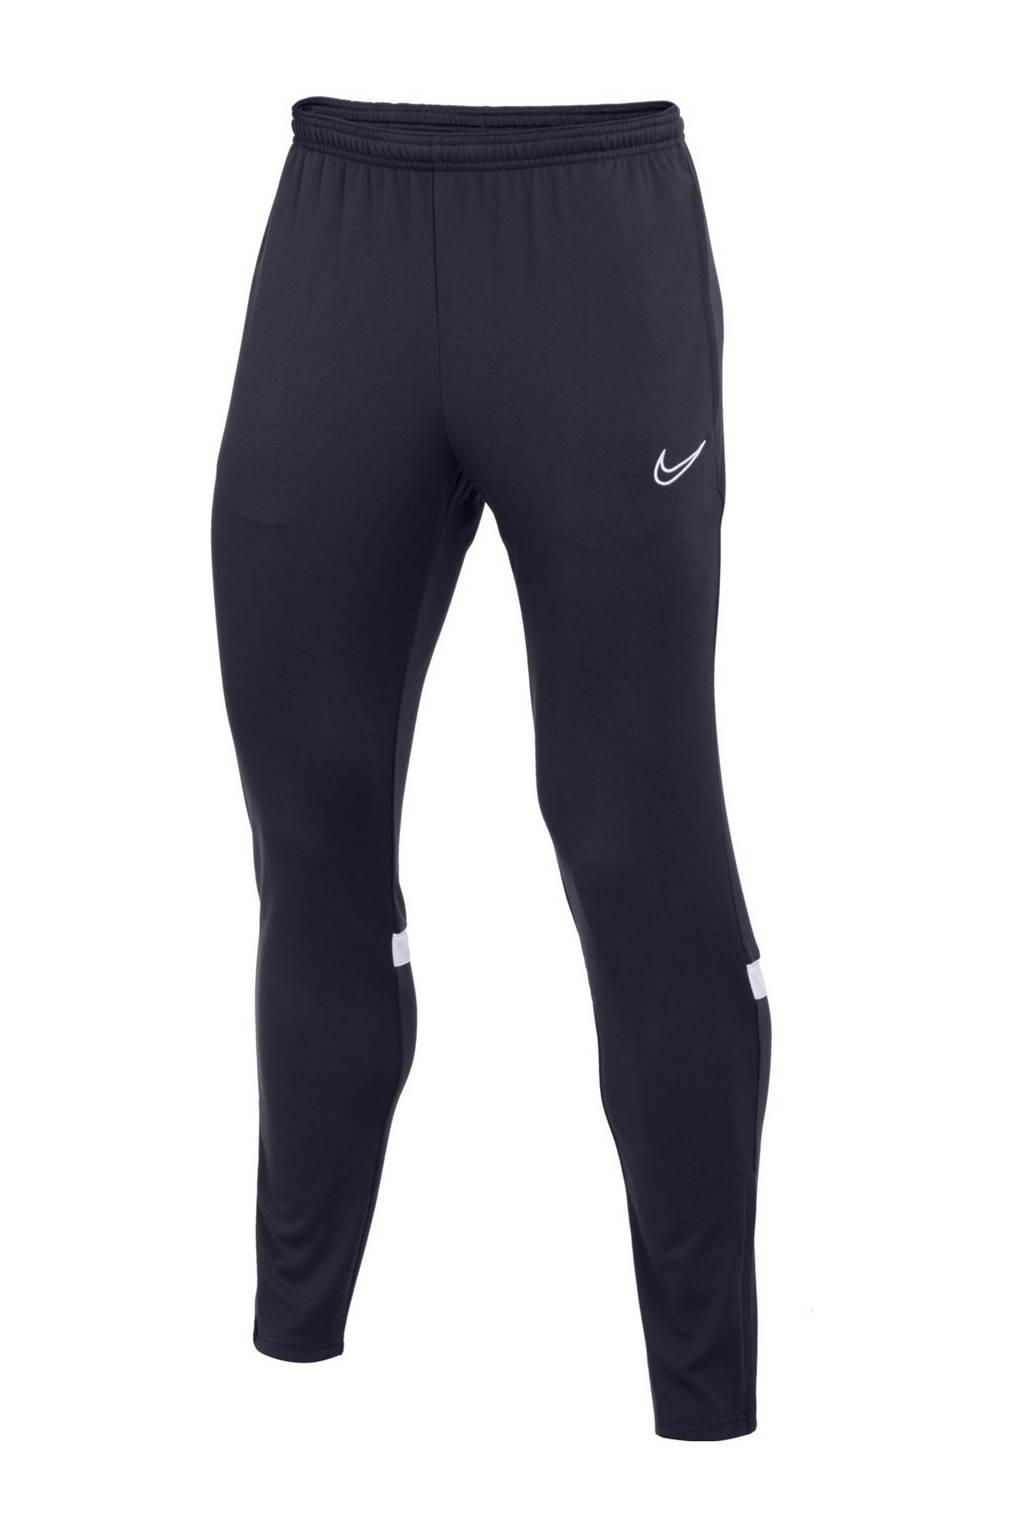 Nike Senior  voetbalbroek donkerblauw/wit, Donkerblauw/wit